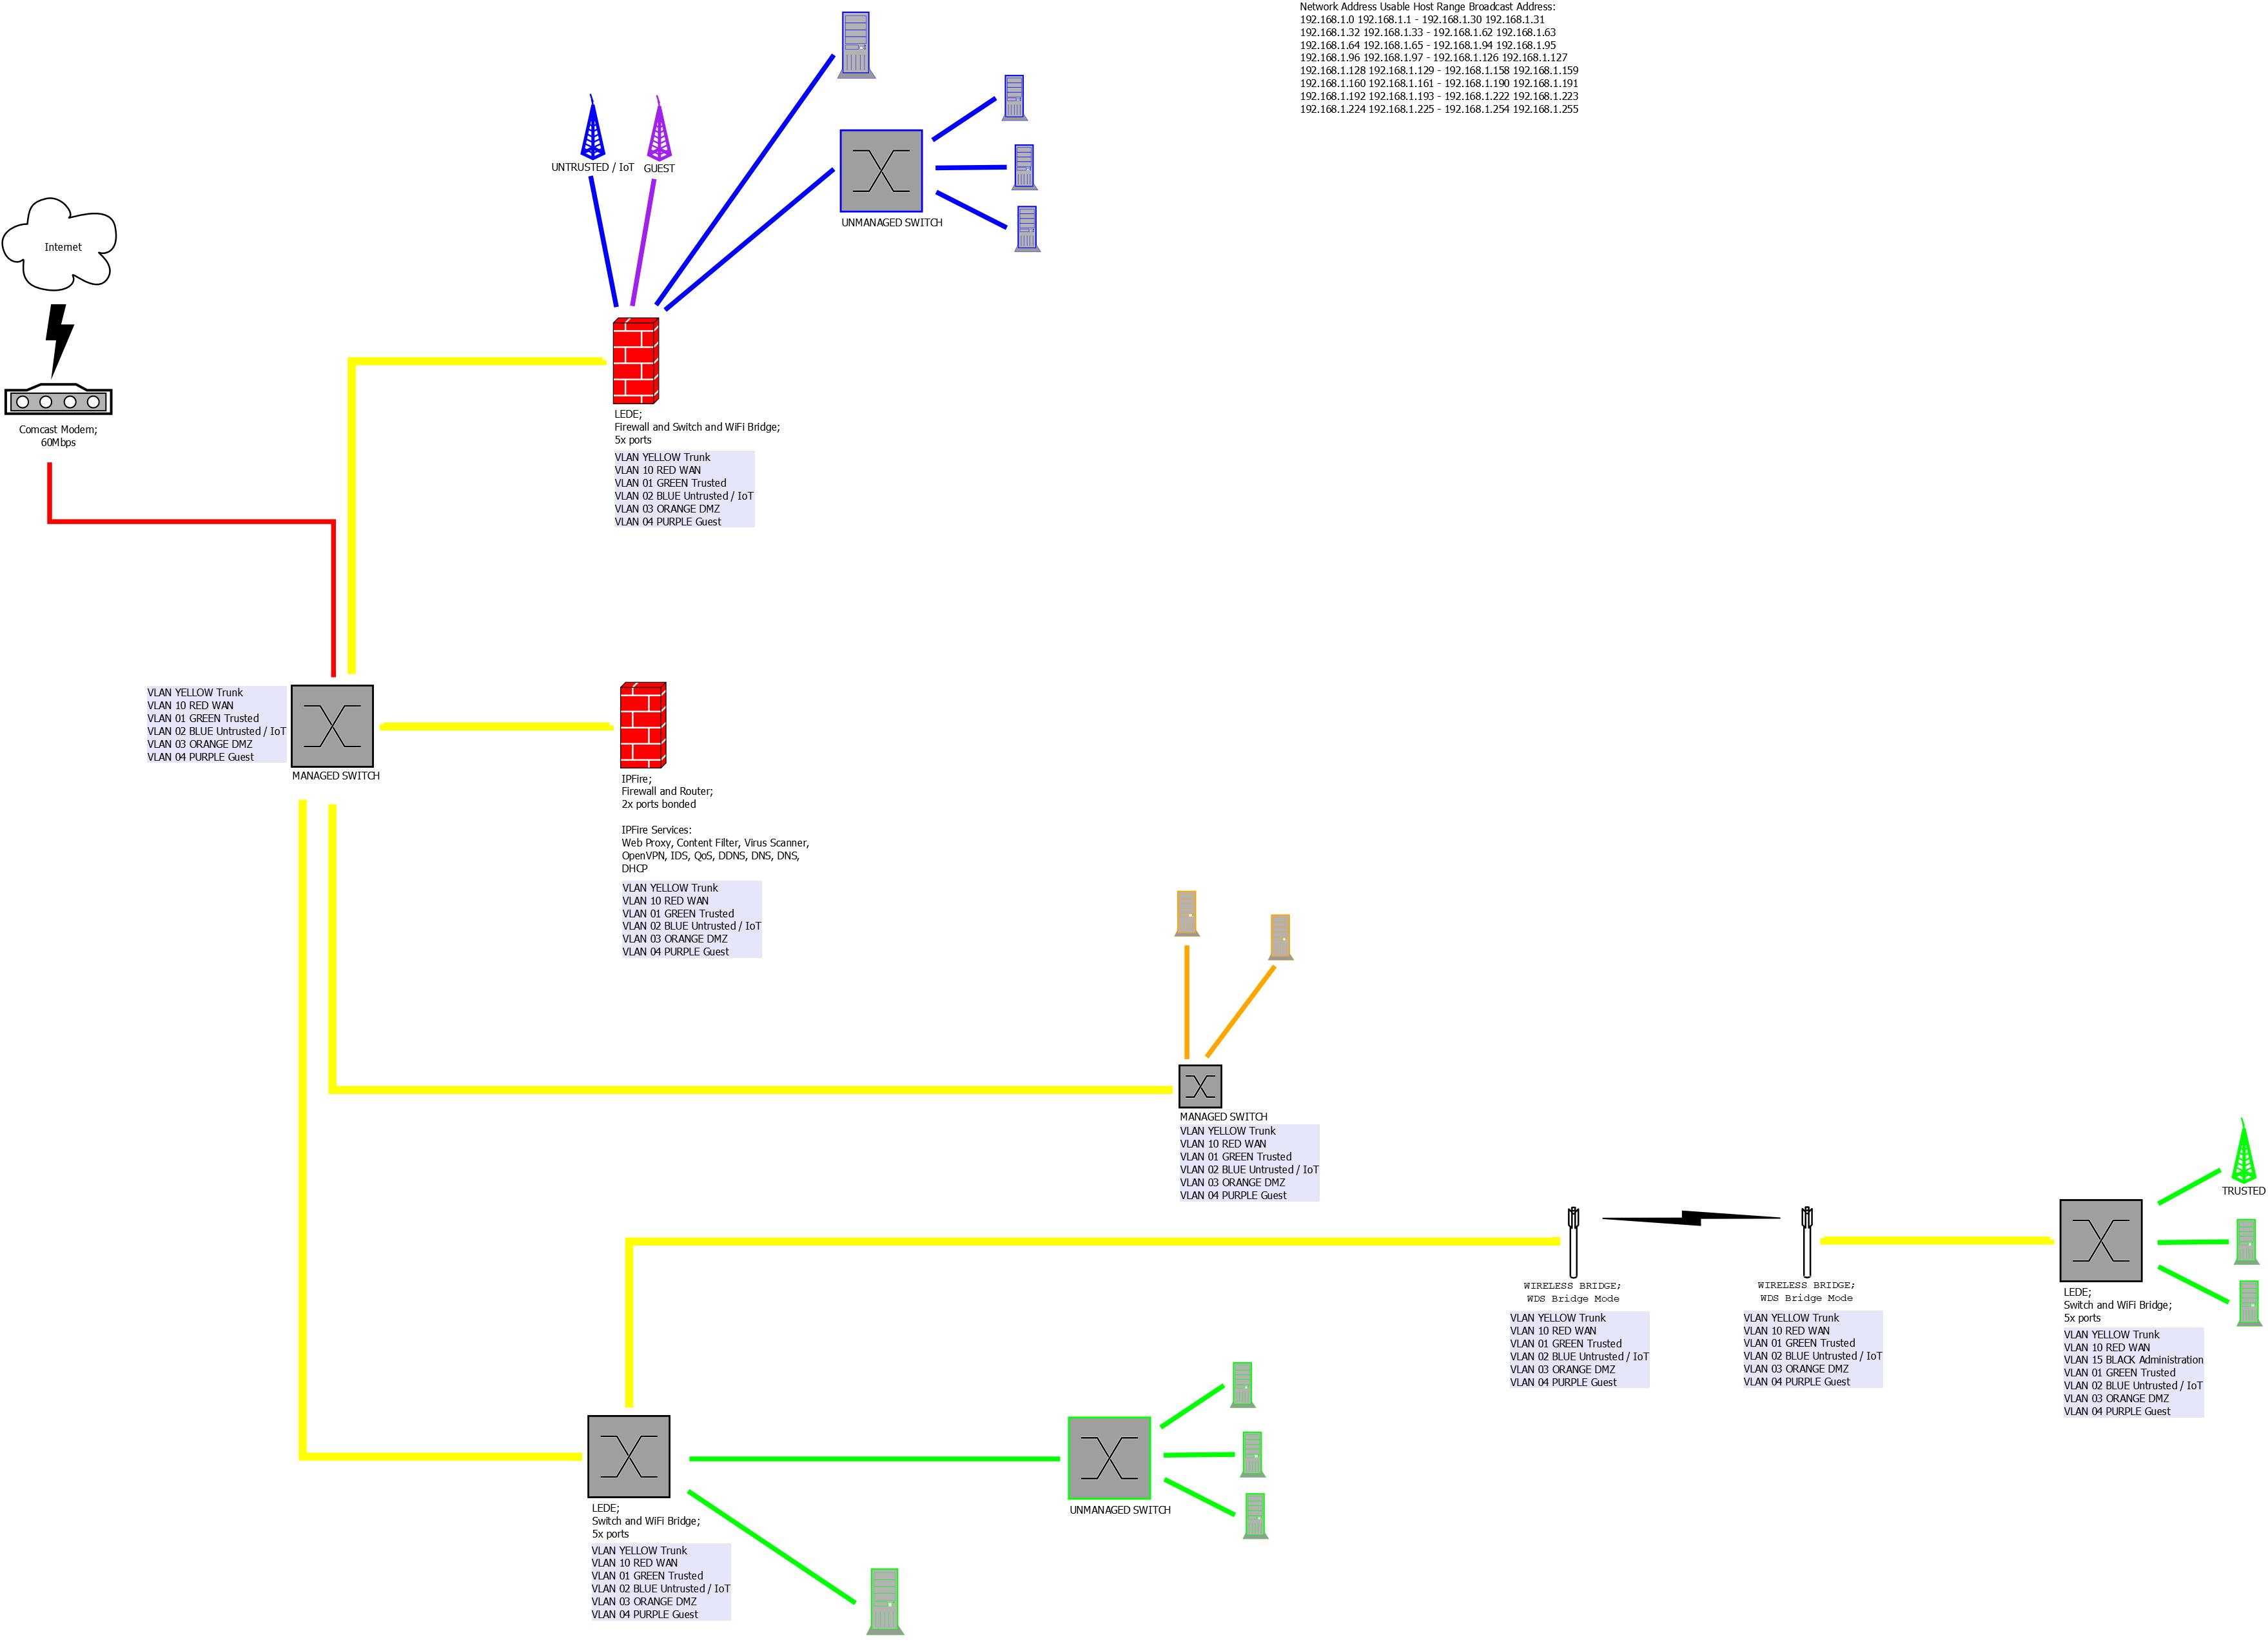 smb network setup diagram wiring diagram master • soho network topology home design ideas network design diagram lan network diagram